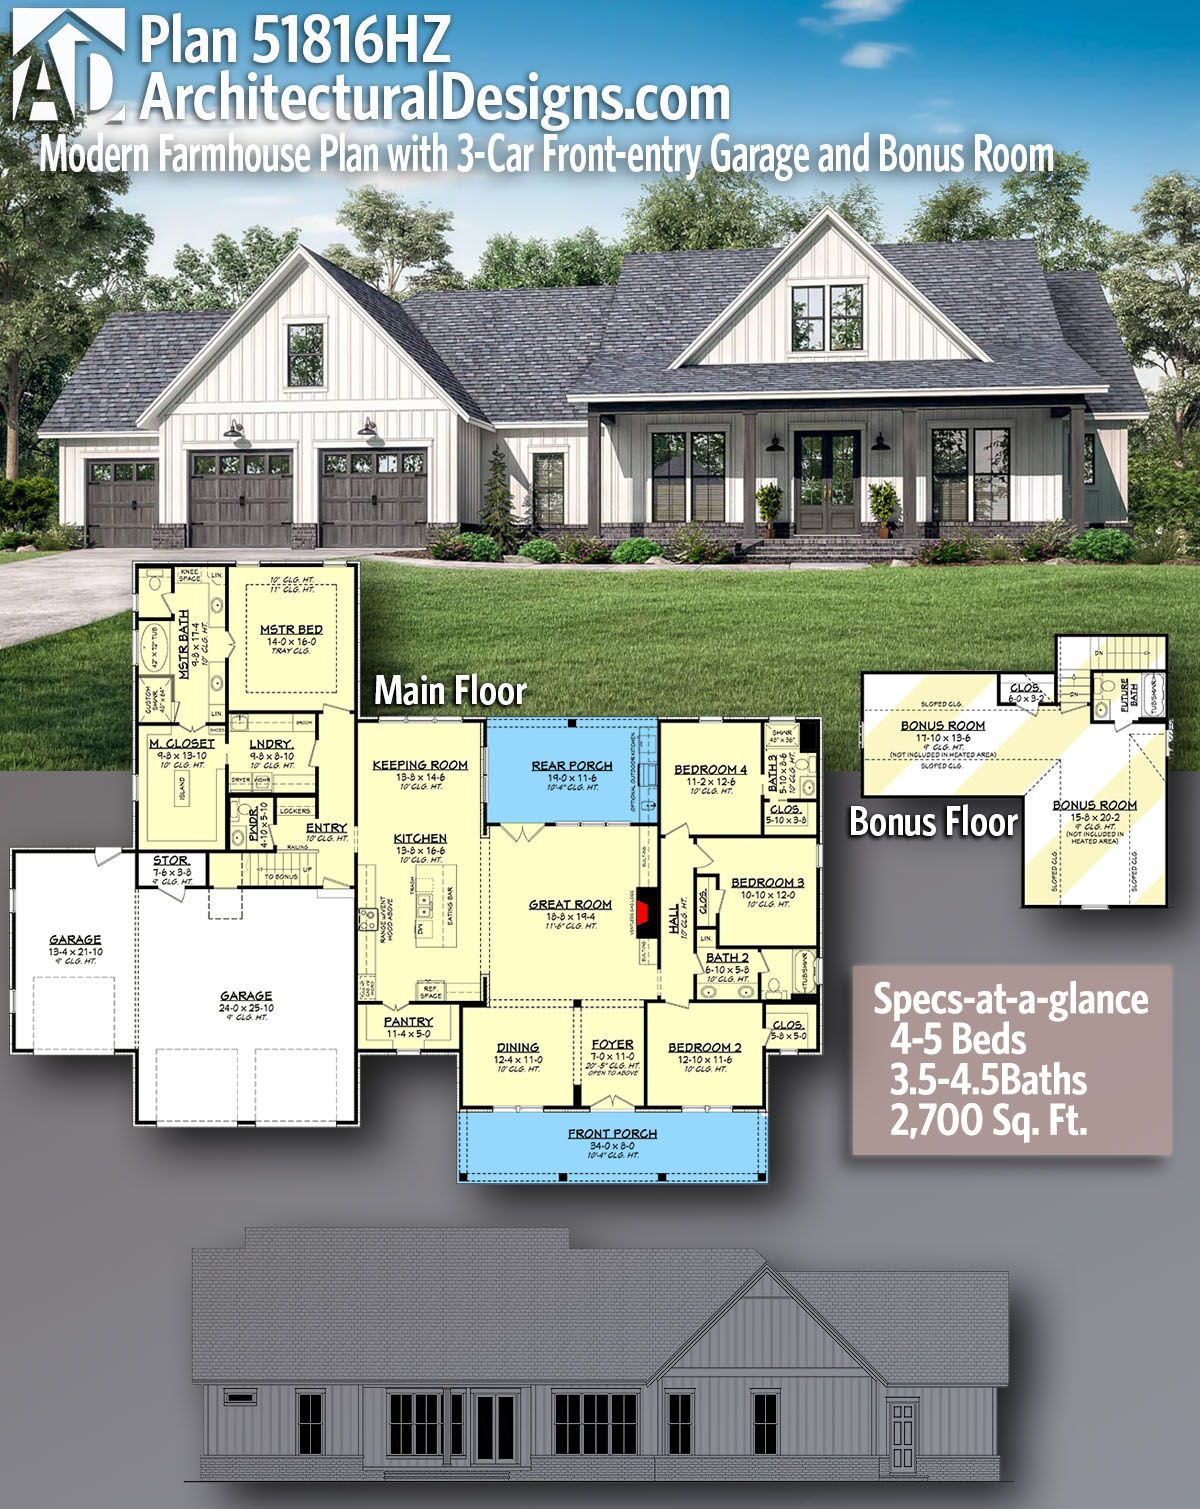 Plan 51816hz Modern Farmhouse Plan With 3 Car Front Entry Garage And Bonus Room Modern Farmhouse Plans House Plans Farmhouse Craftsman House Plans